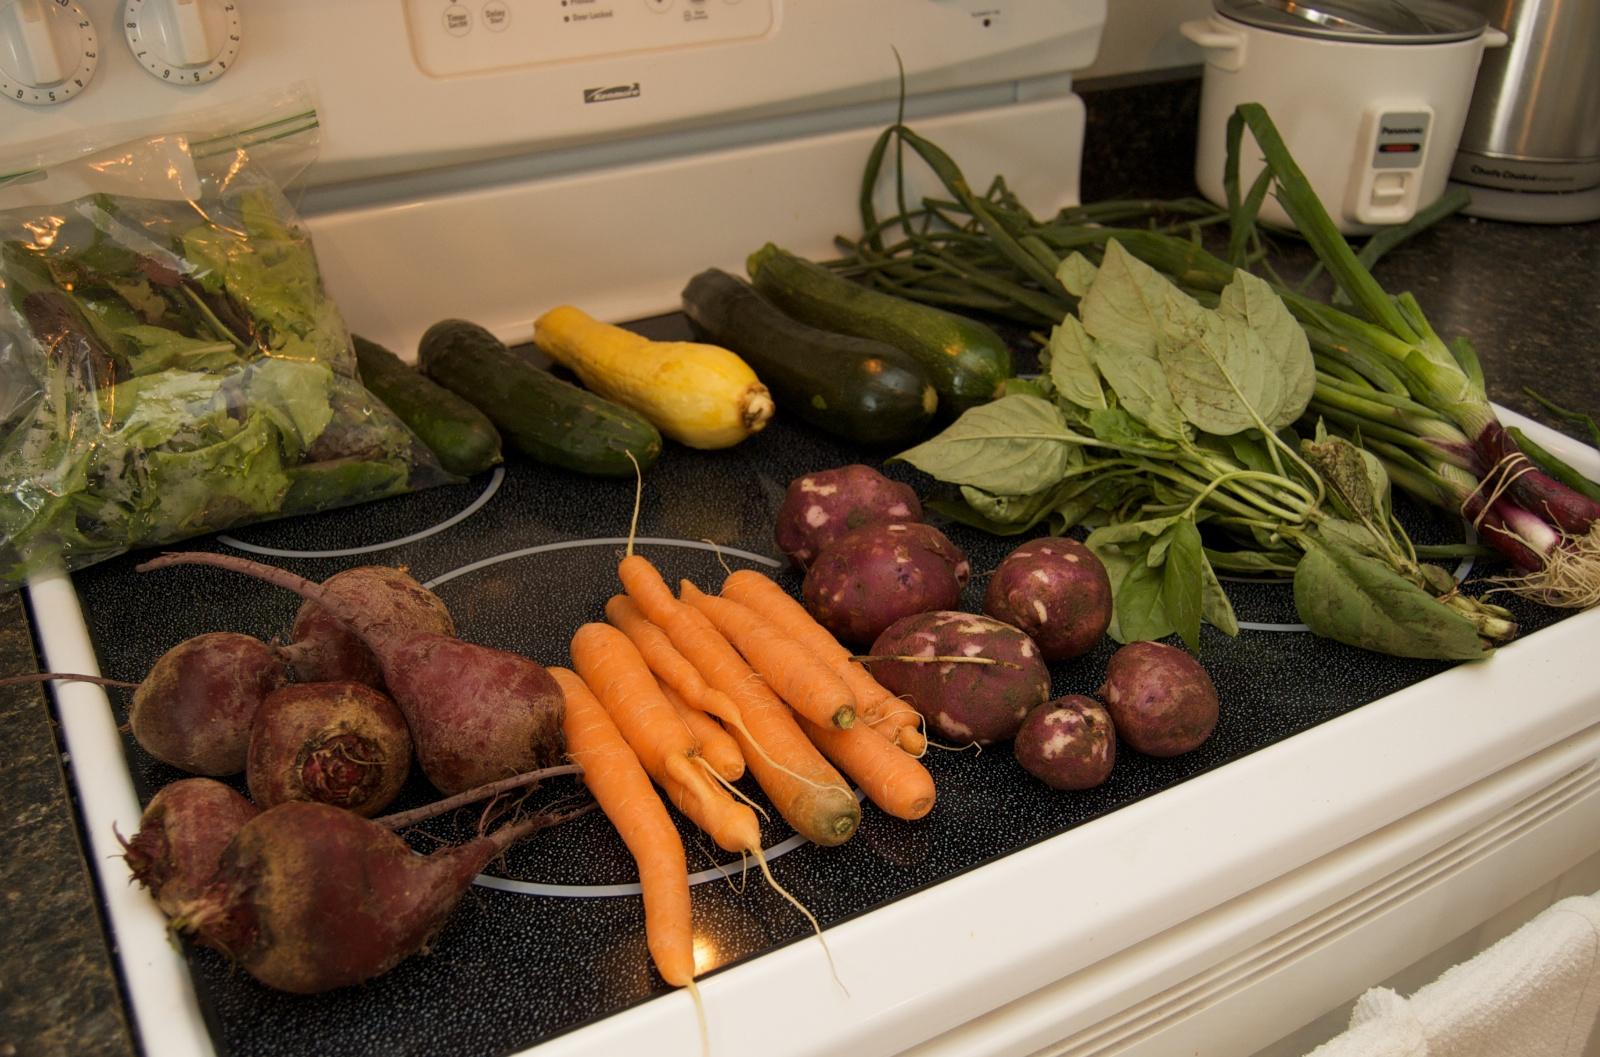 http://blog.rickk.com/food/2010/07/15/csa5-1.jpg